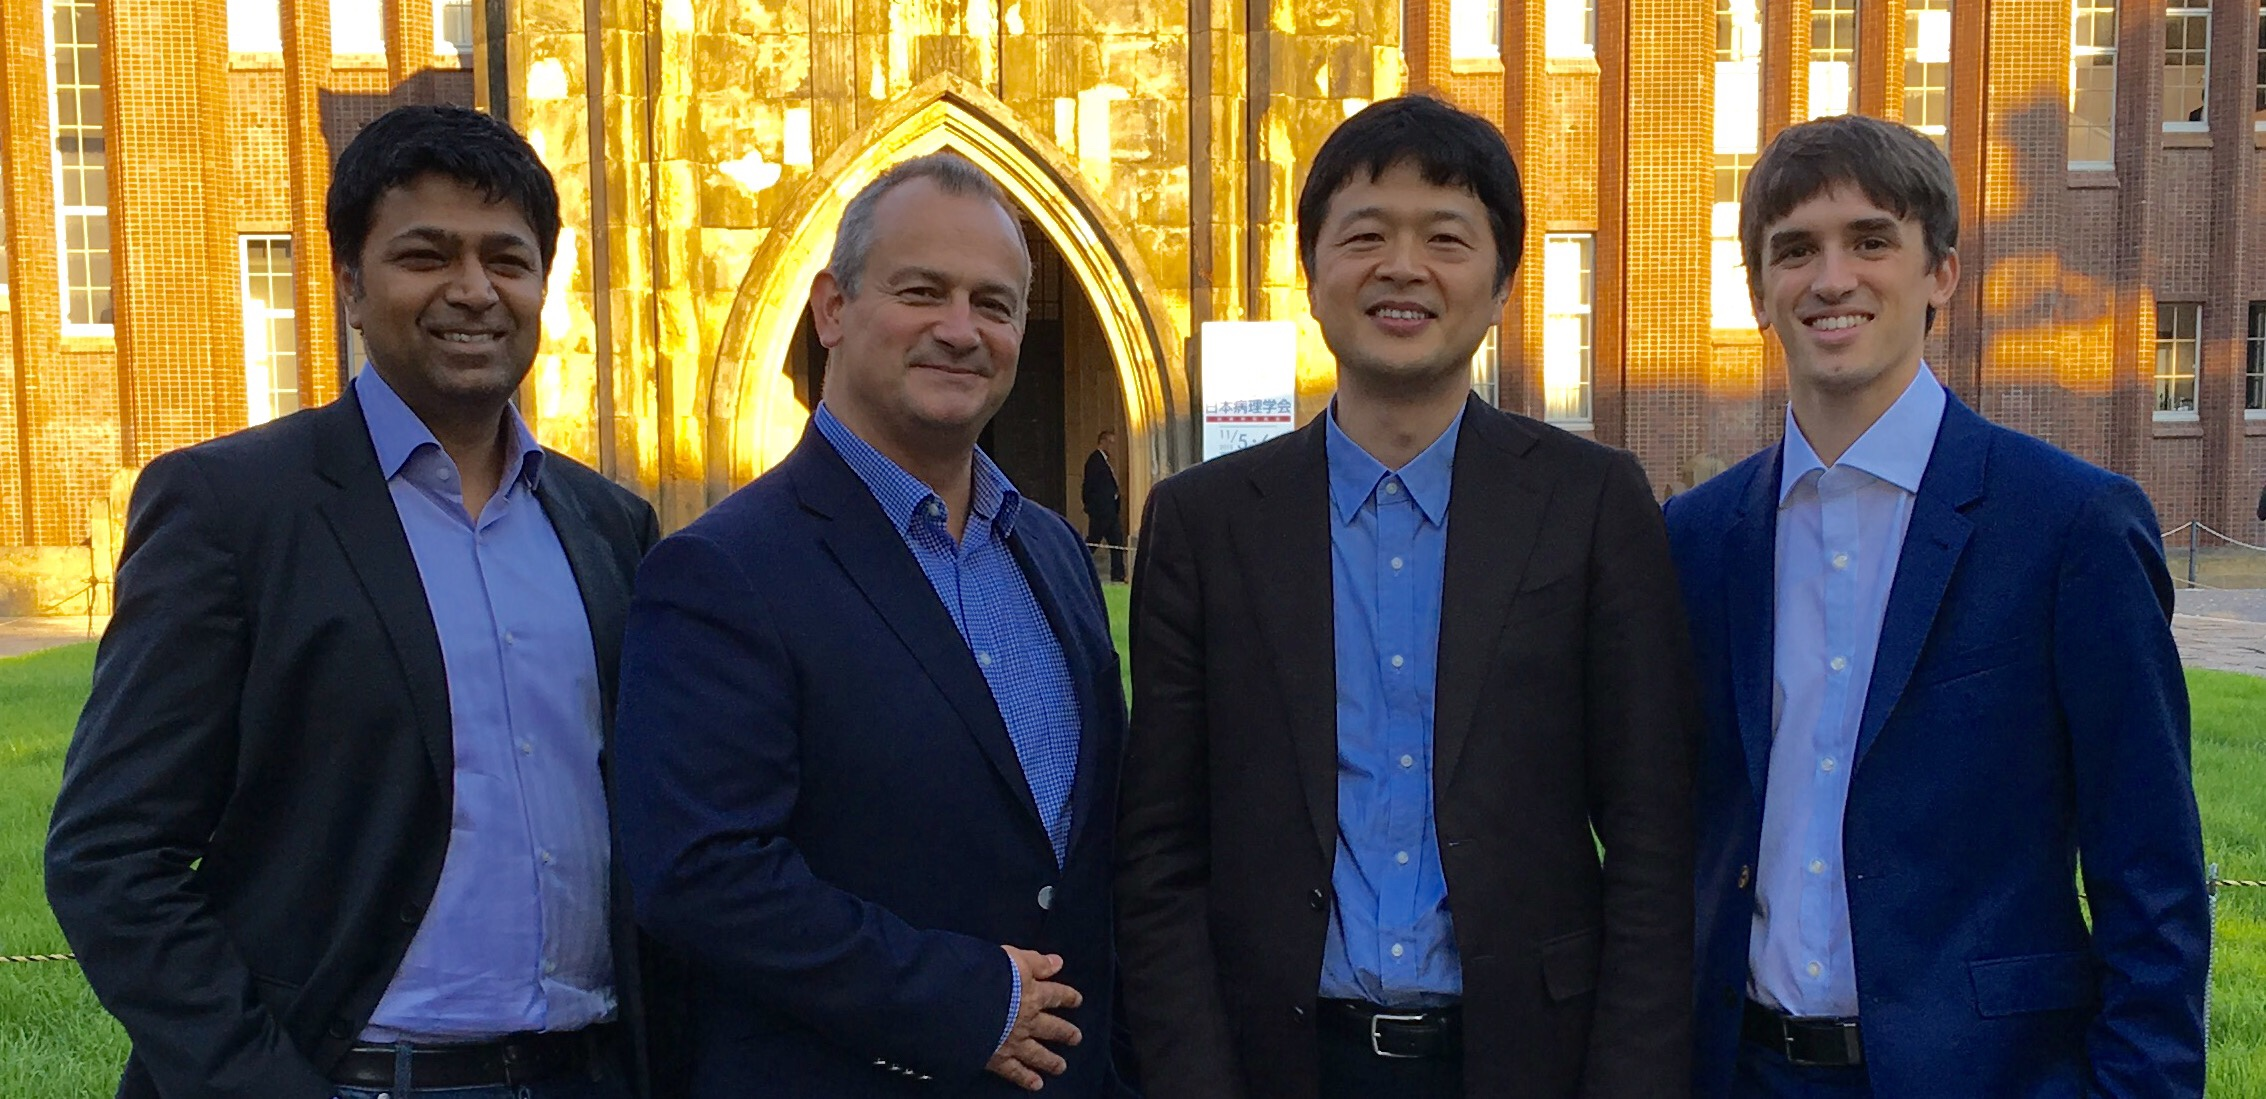 L to R: Prof Sriram Subramanian co-founder Ultrahaptics, Steve Cliffe, Prof Hiroyuki Shinoda, University of Tokyo and Tom Carter, co-founder Ultrahaptics.